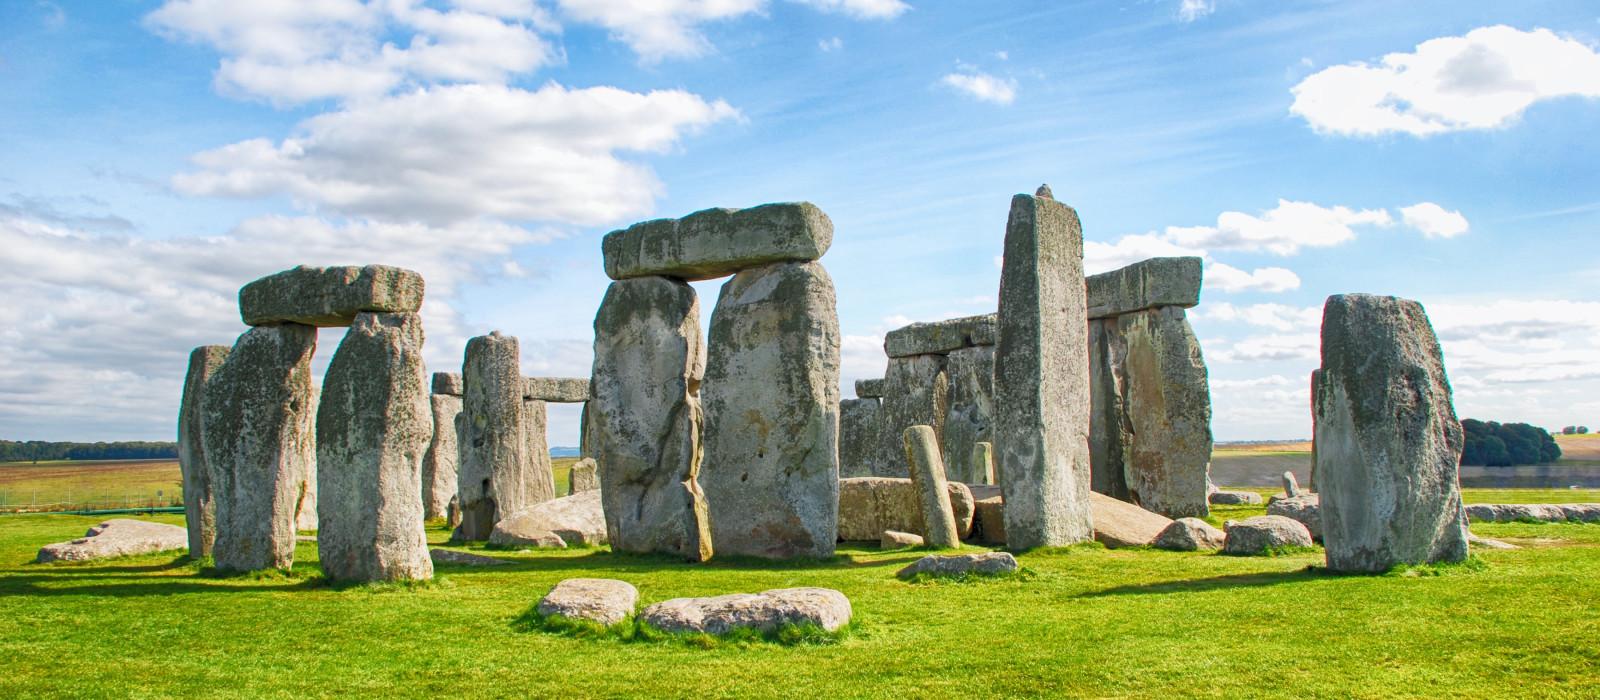 Enchanting Travels Europe Tours Stonehenge with Blue Sky